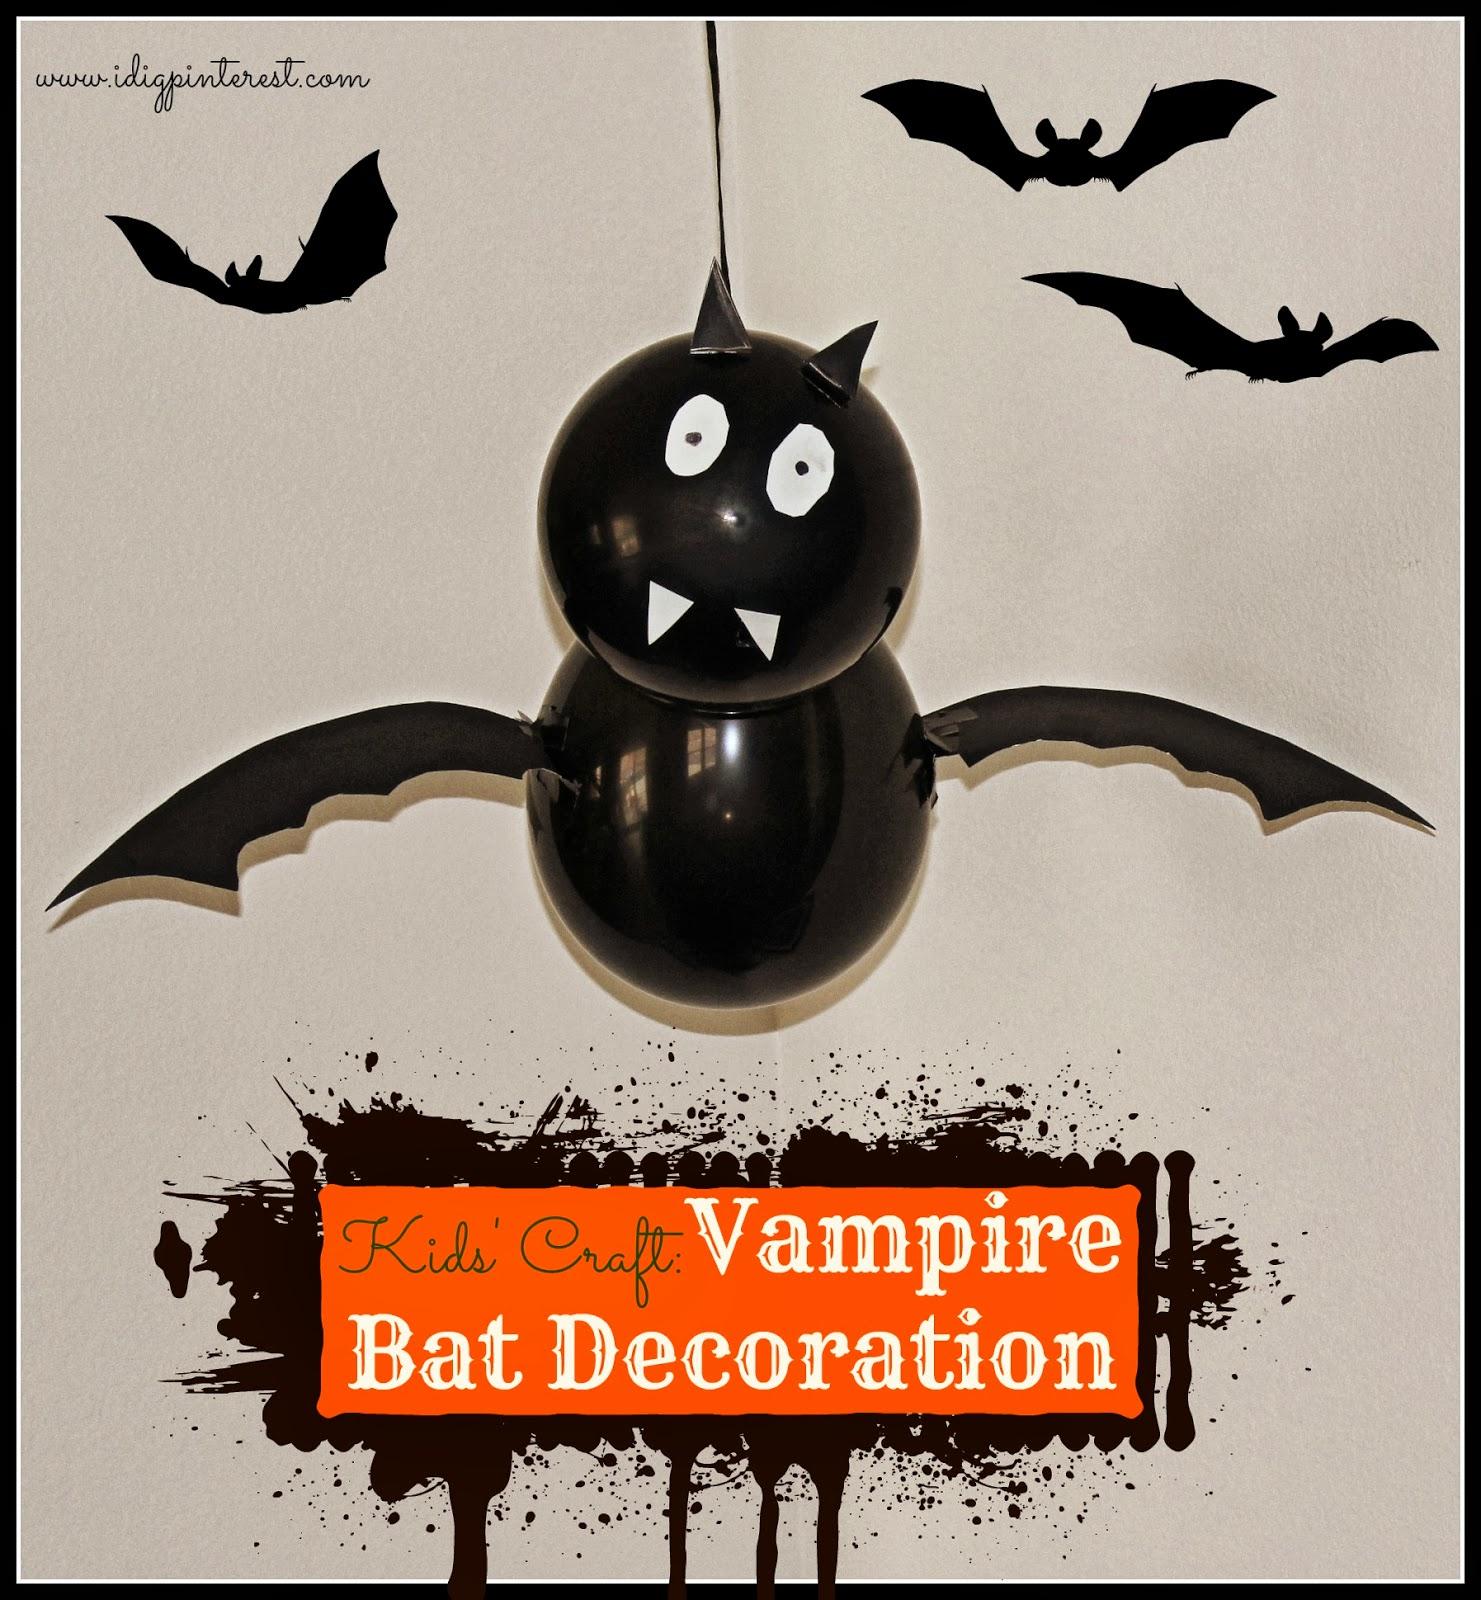 Halloween Kids Craft Vampire Bat Decoration I Dig Pinterest